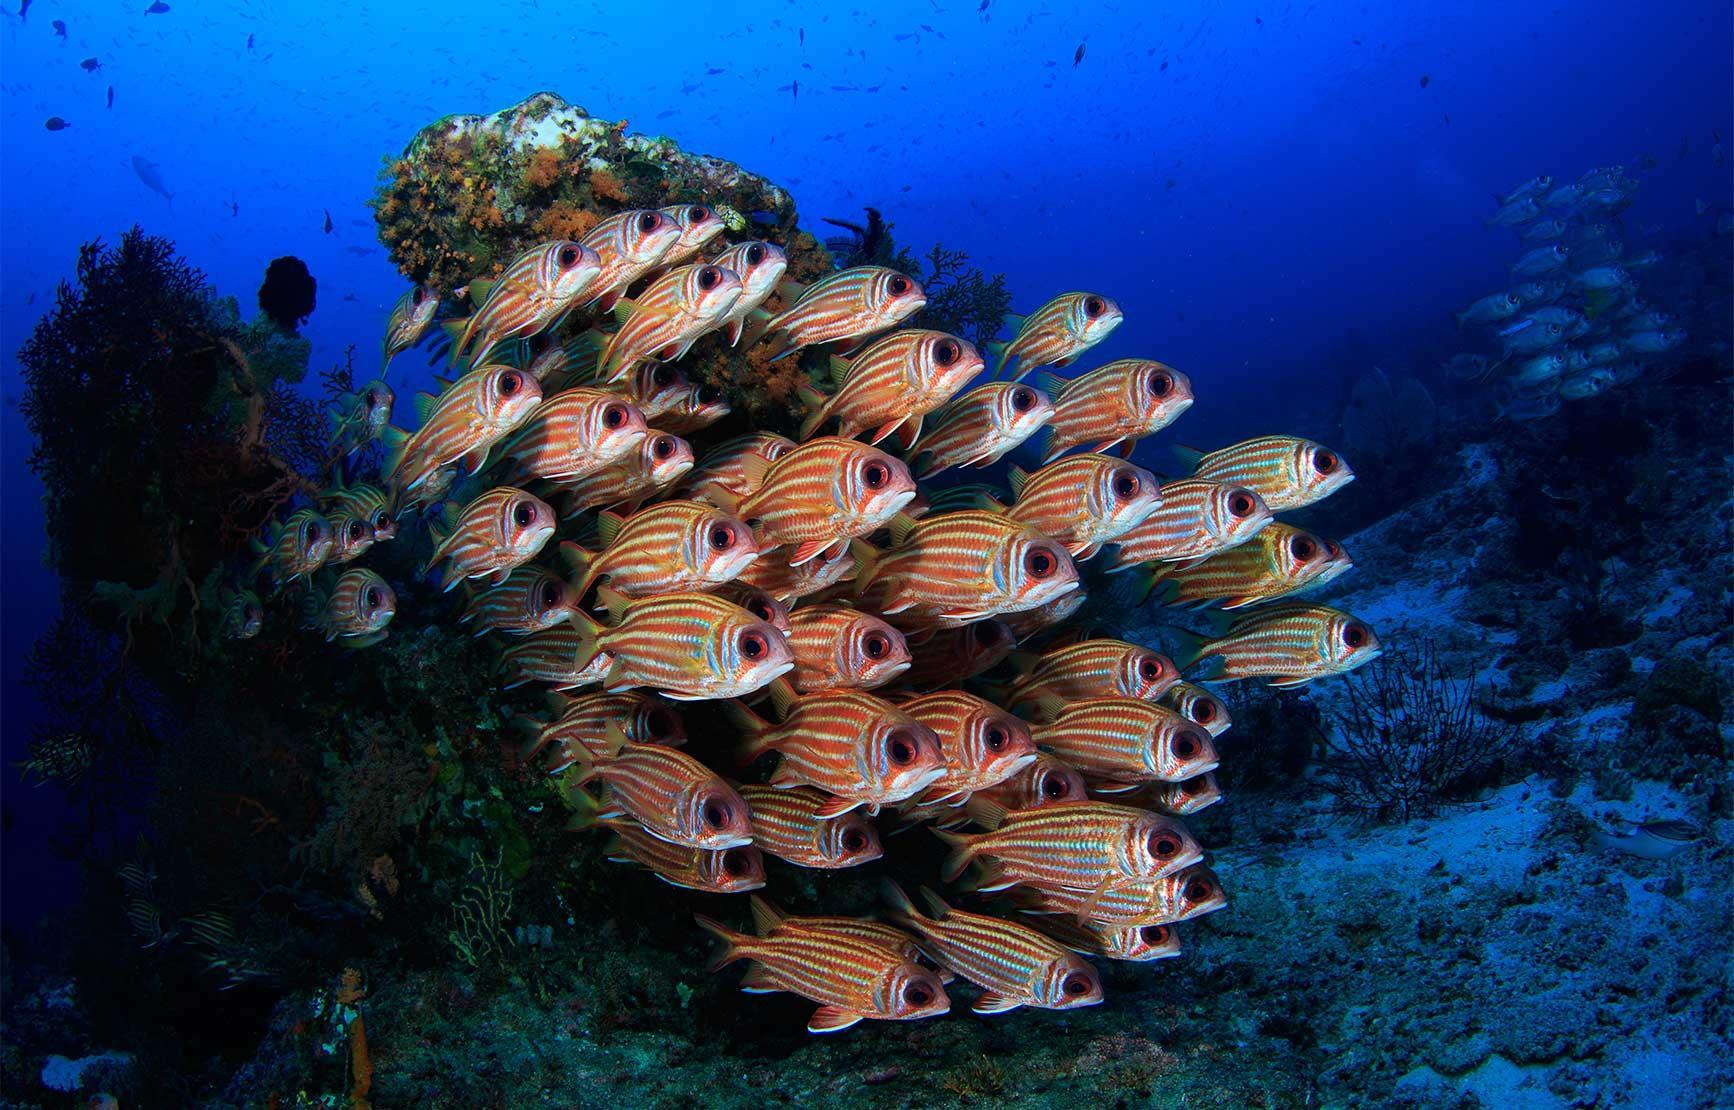 school of fish swimming near ocean floor